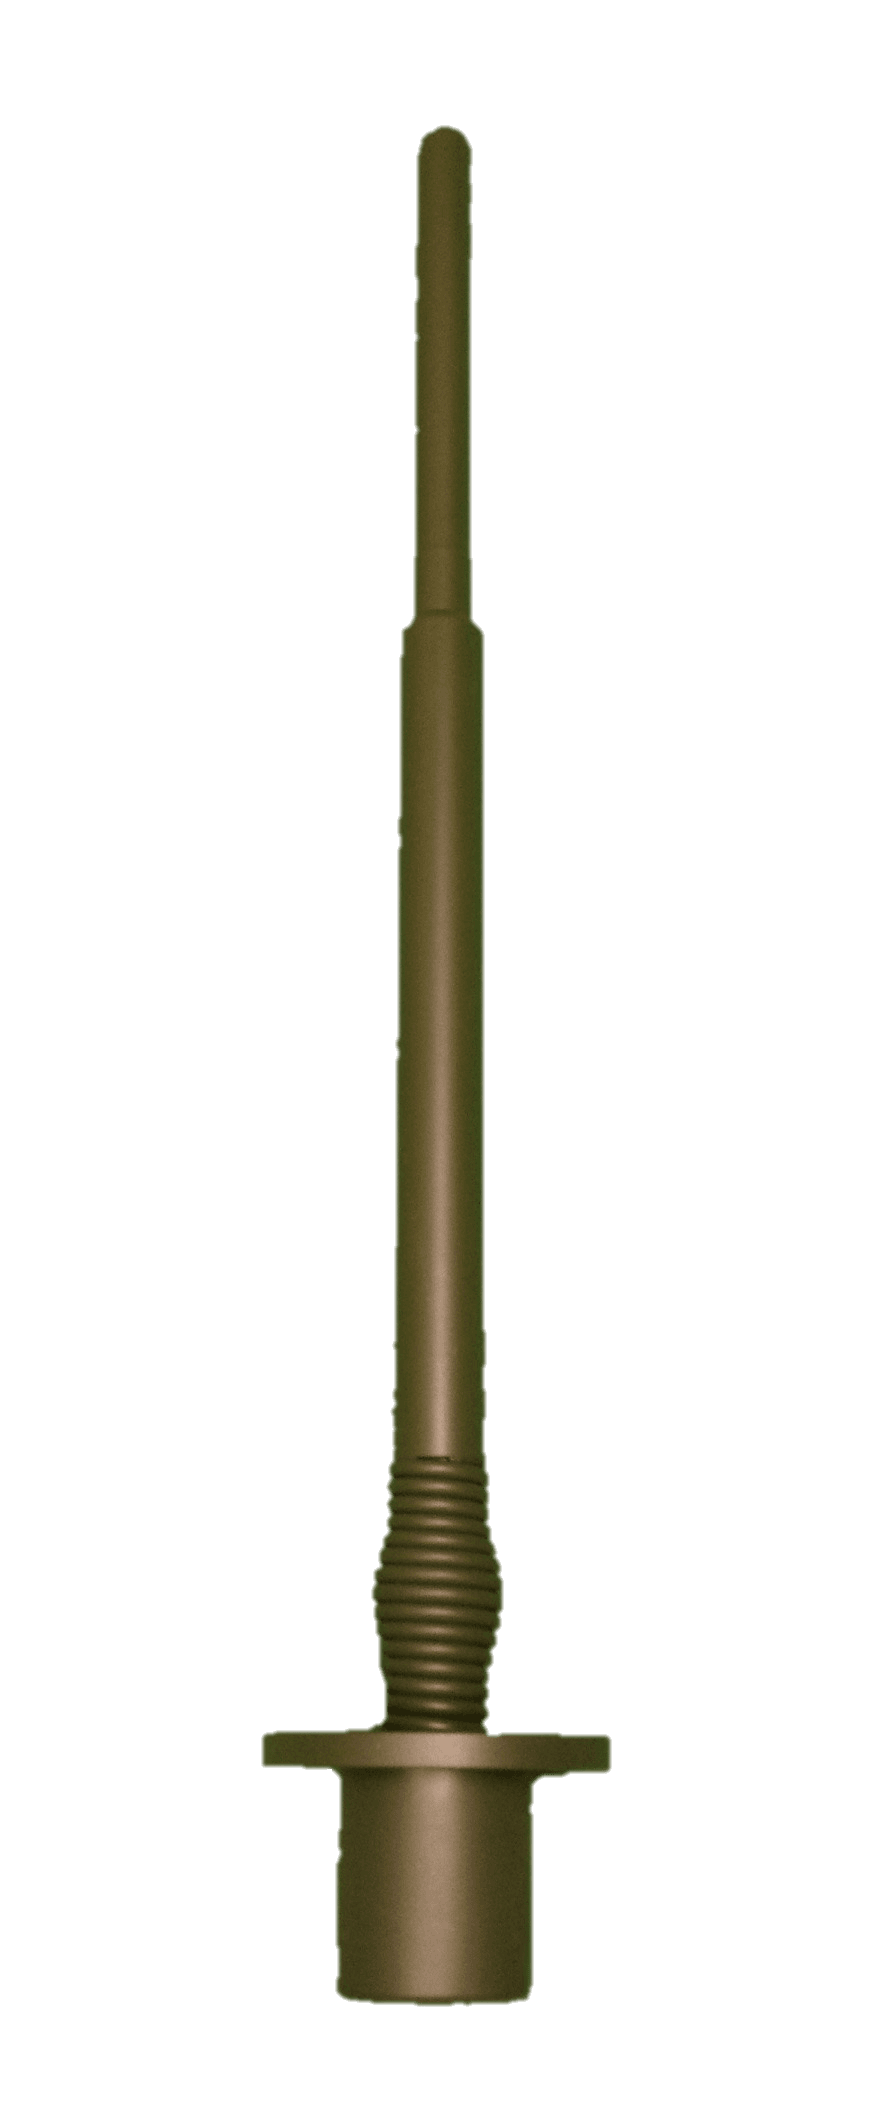 4400-4900 MHz – MVDP4.4-4.9-7-D